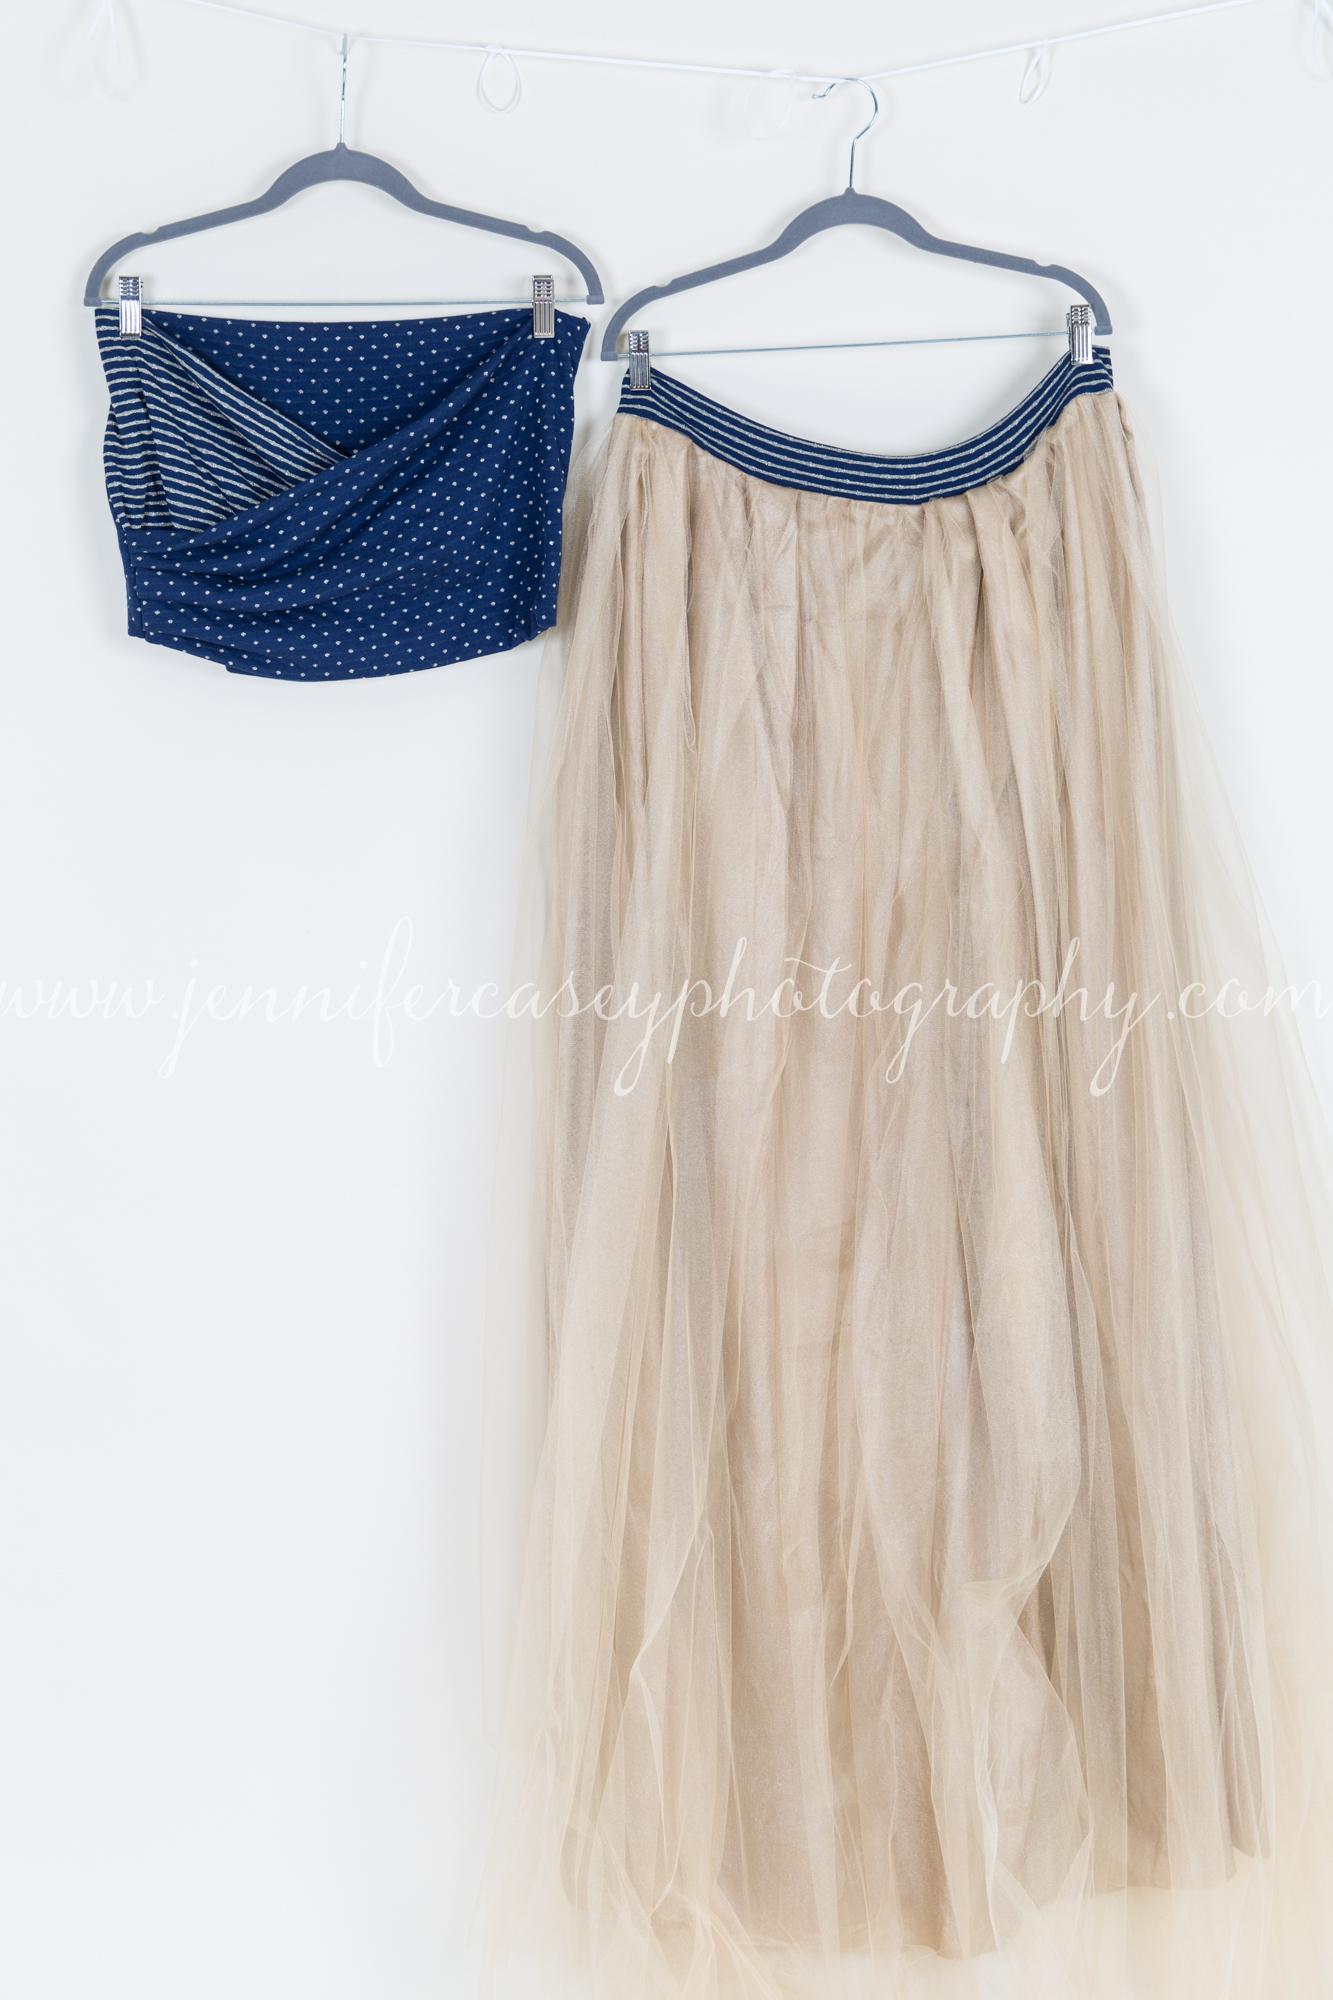 Studio Props Maternity Dresses-2.jpg